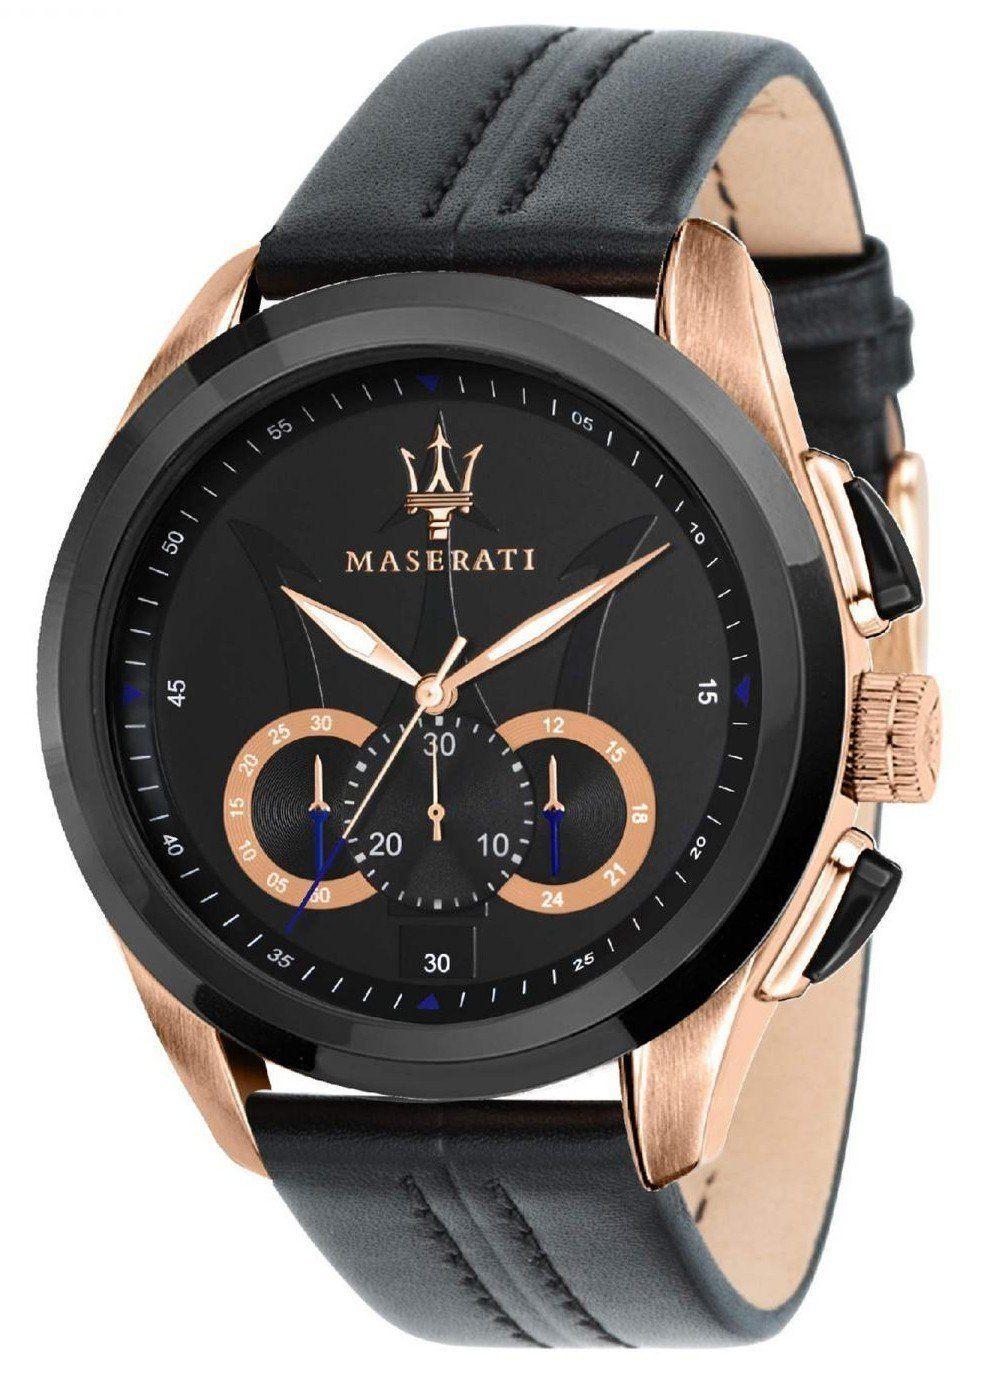 Maserati Traguardo Chronograph Quartz R8871612025 Mens Watch Black Vintage Watches For Men Watches For Men Fashion Watches